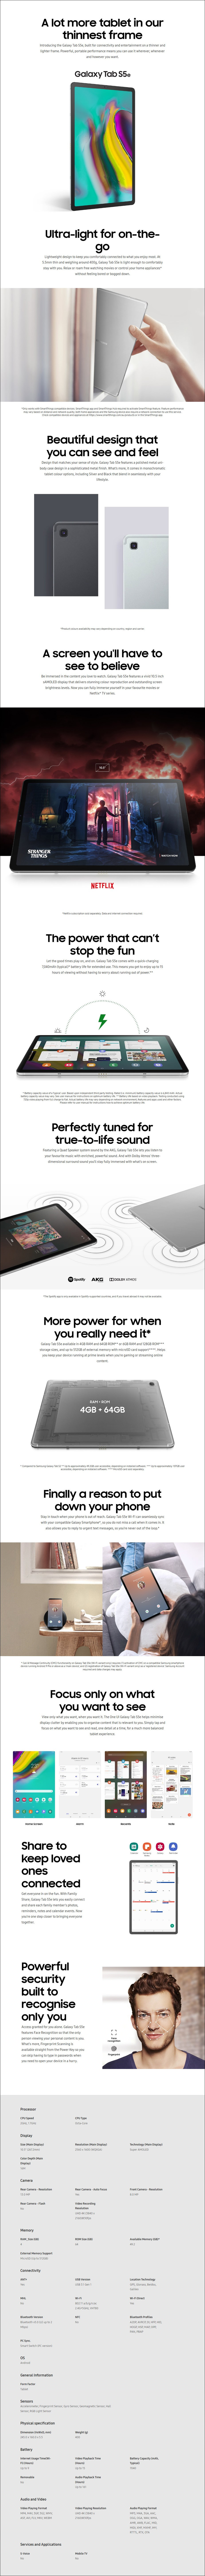 "Samsung Galaxy Tab S5e 10.5"" AMOLED 64GB Wi-Fi - Black - Desktop Overview 1"